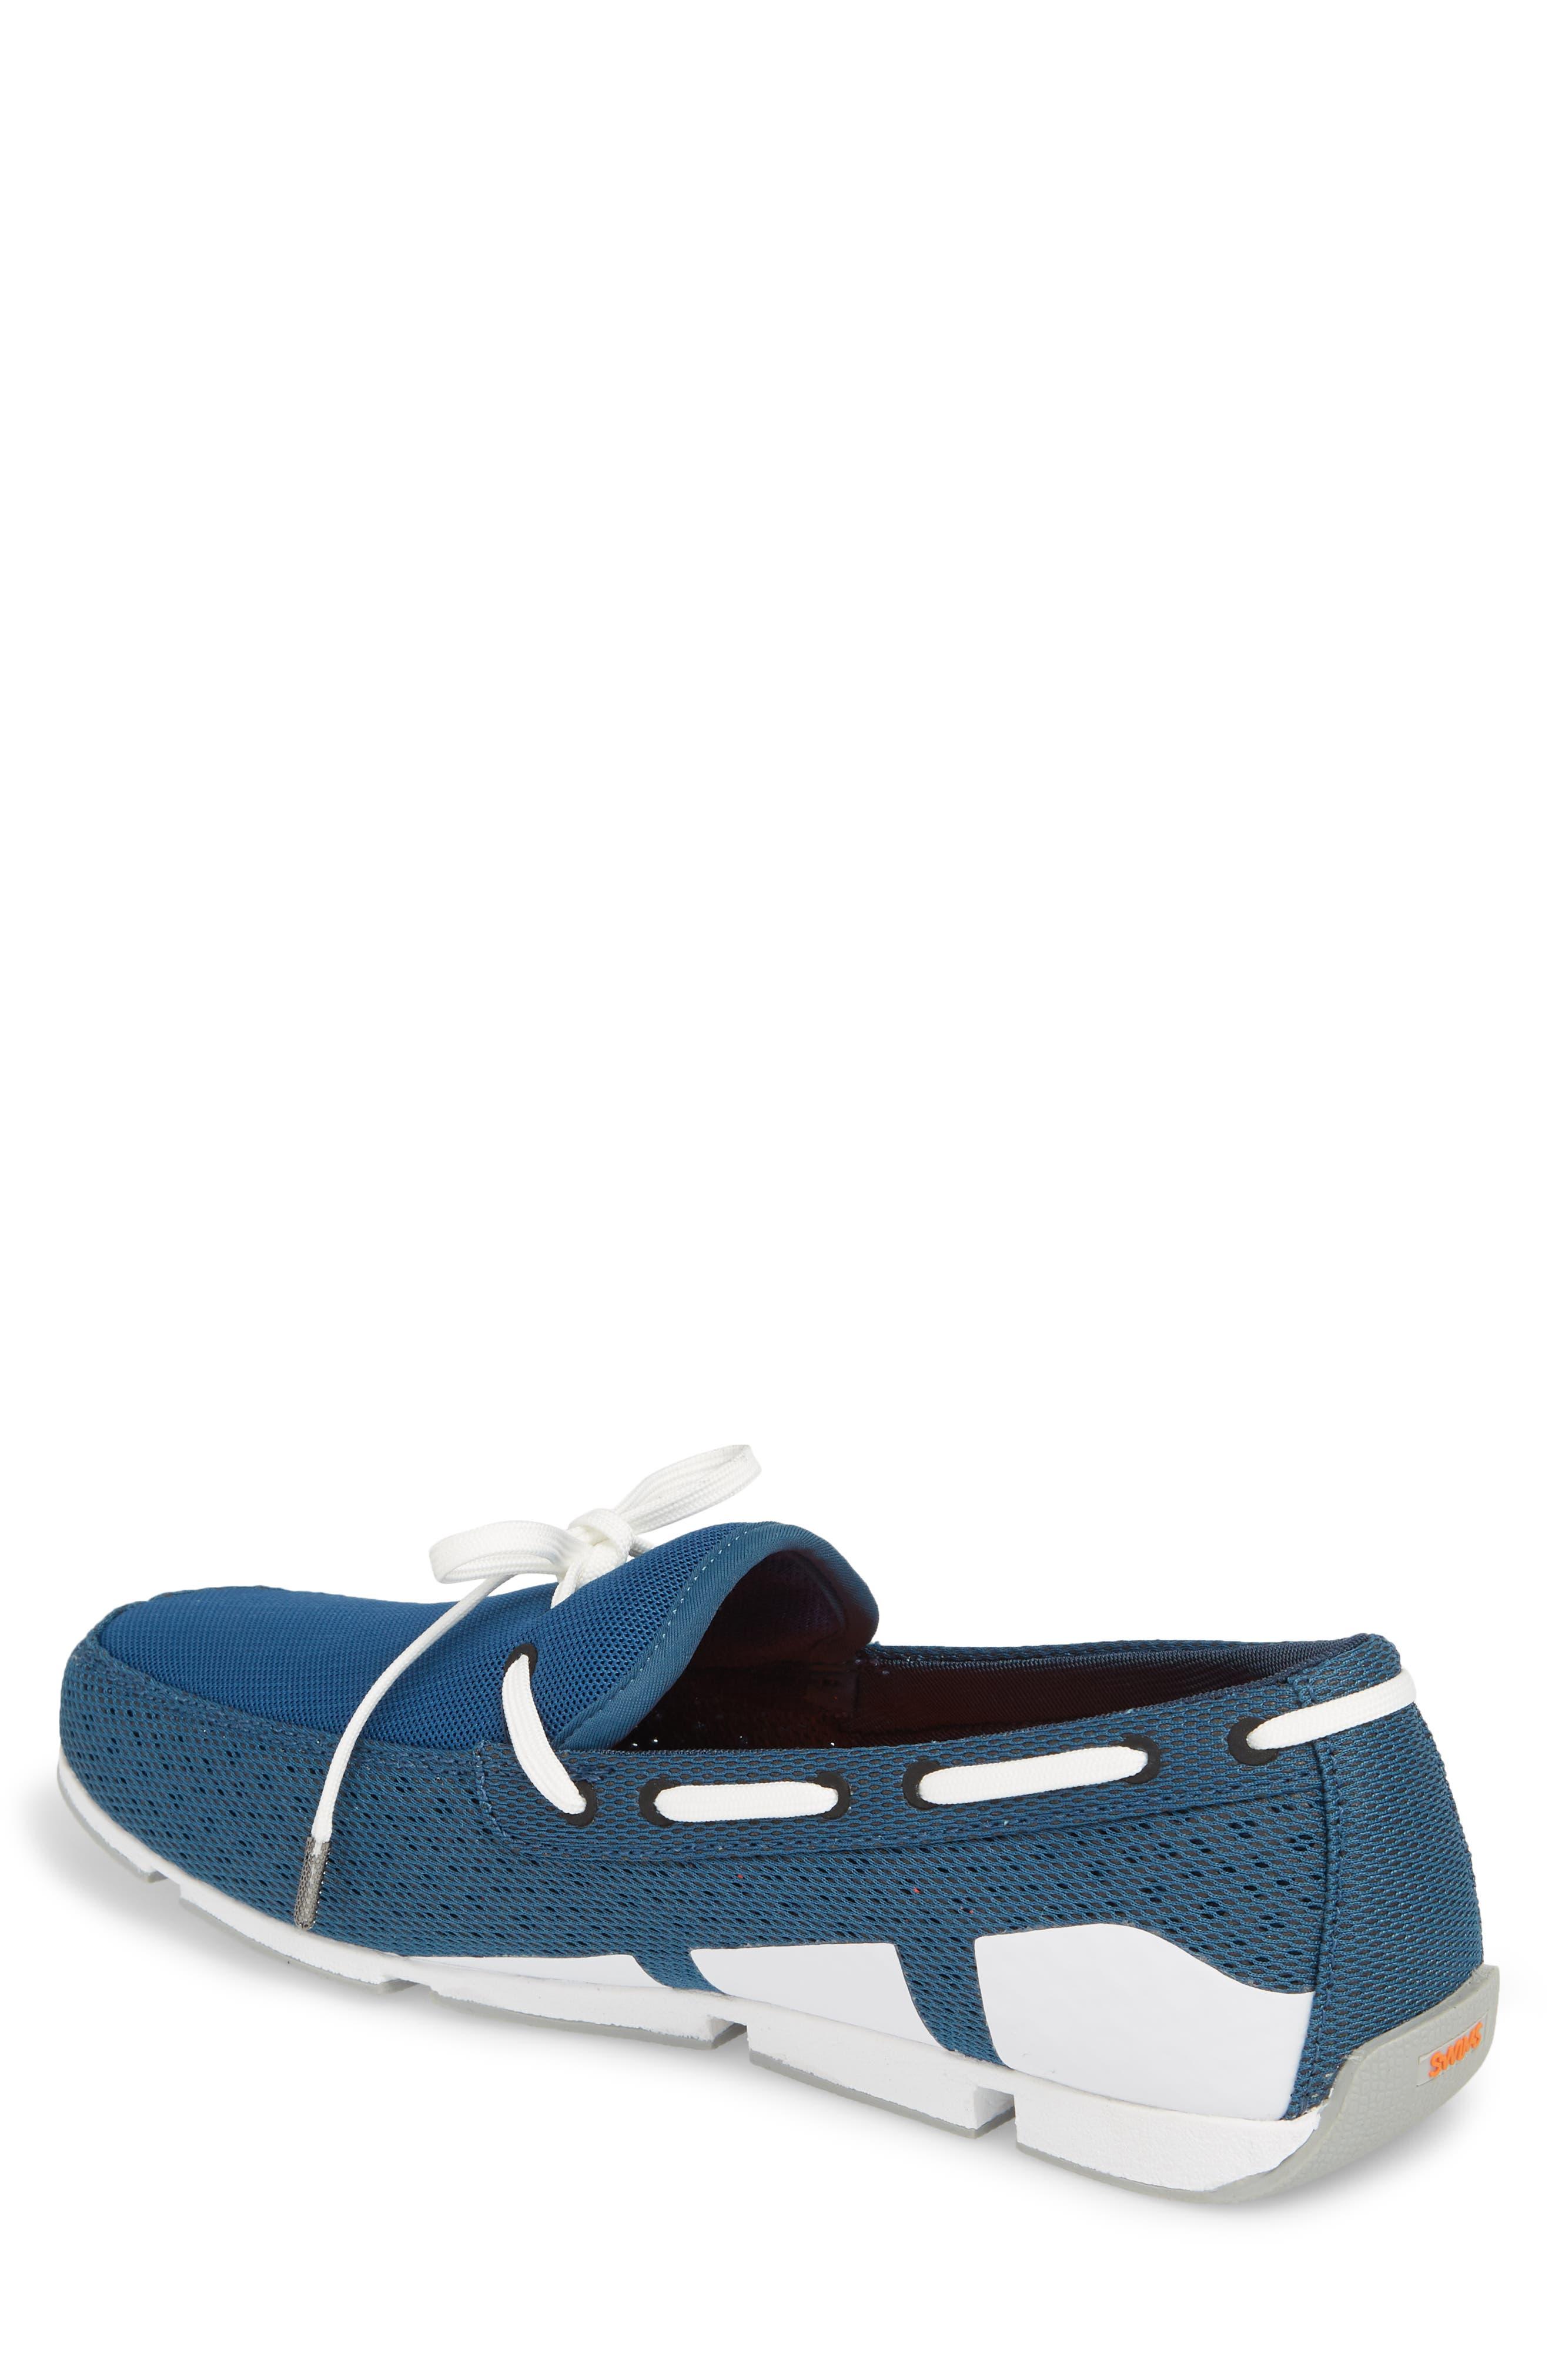 Breeze Loafer,                             Alternate thumbnail 2, color,                             Blue/ White